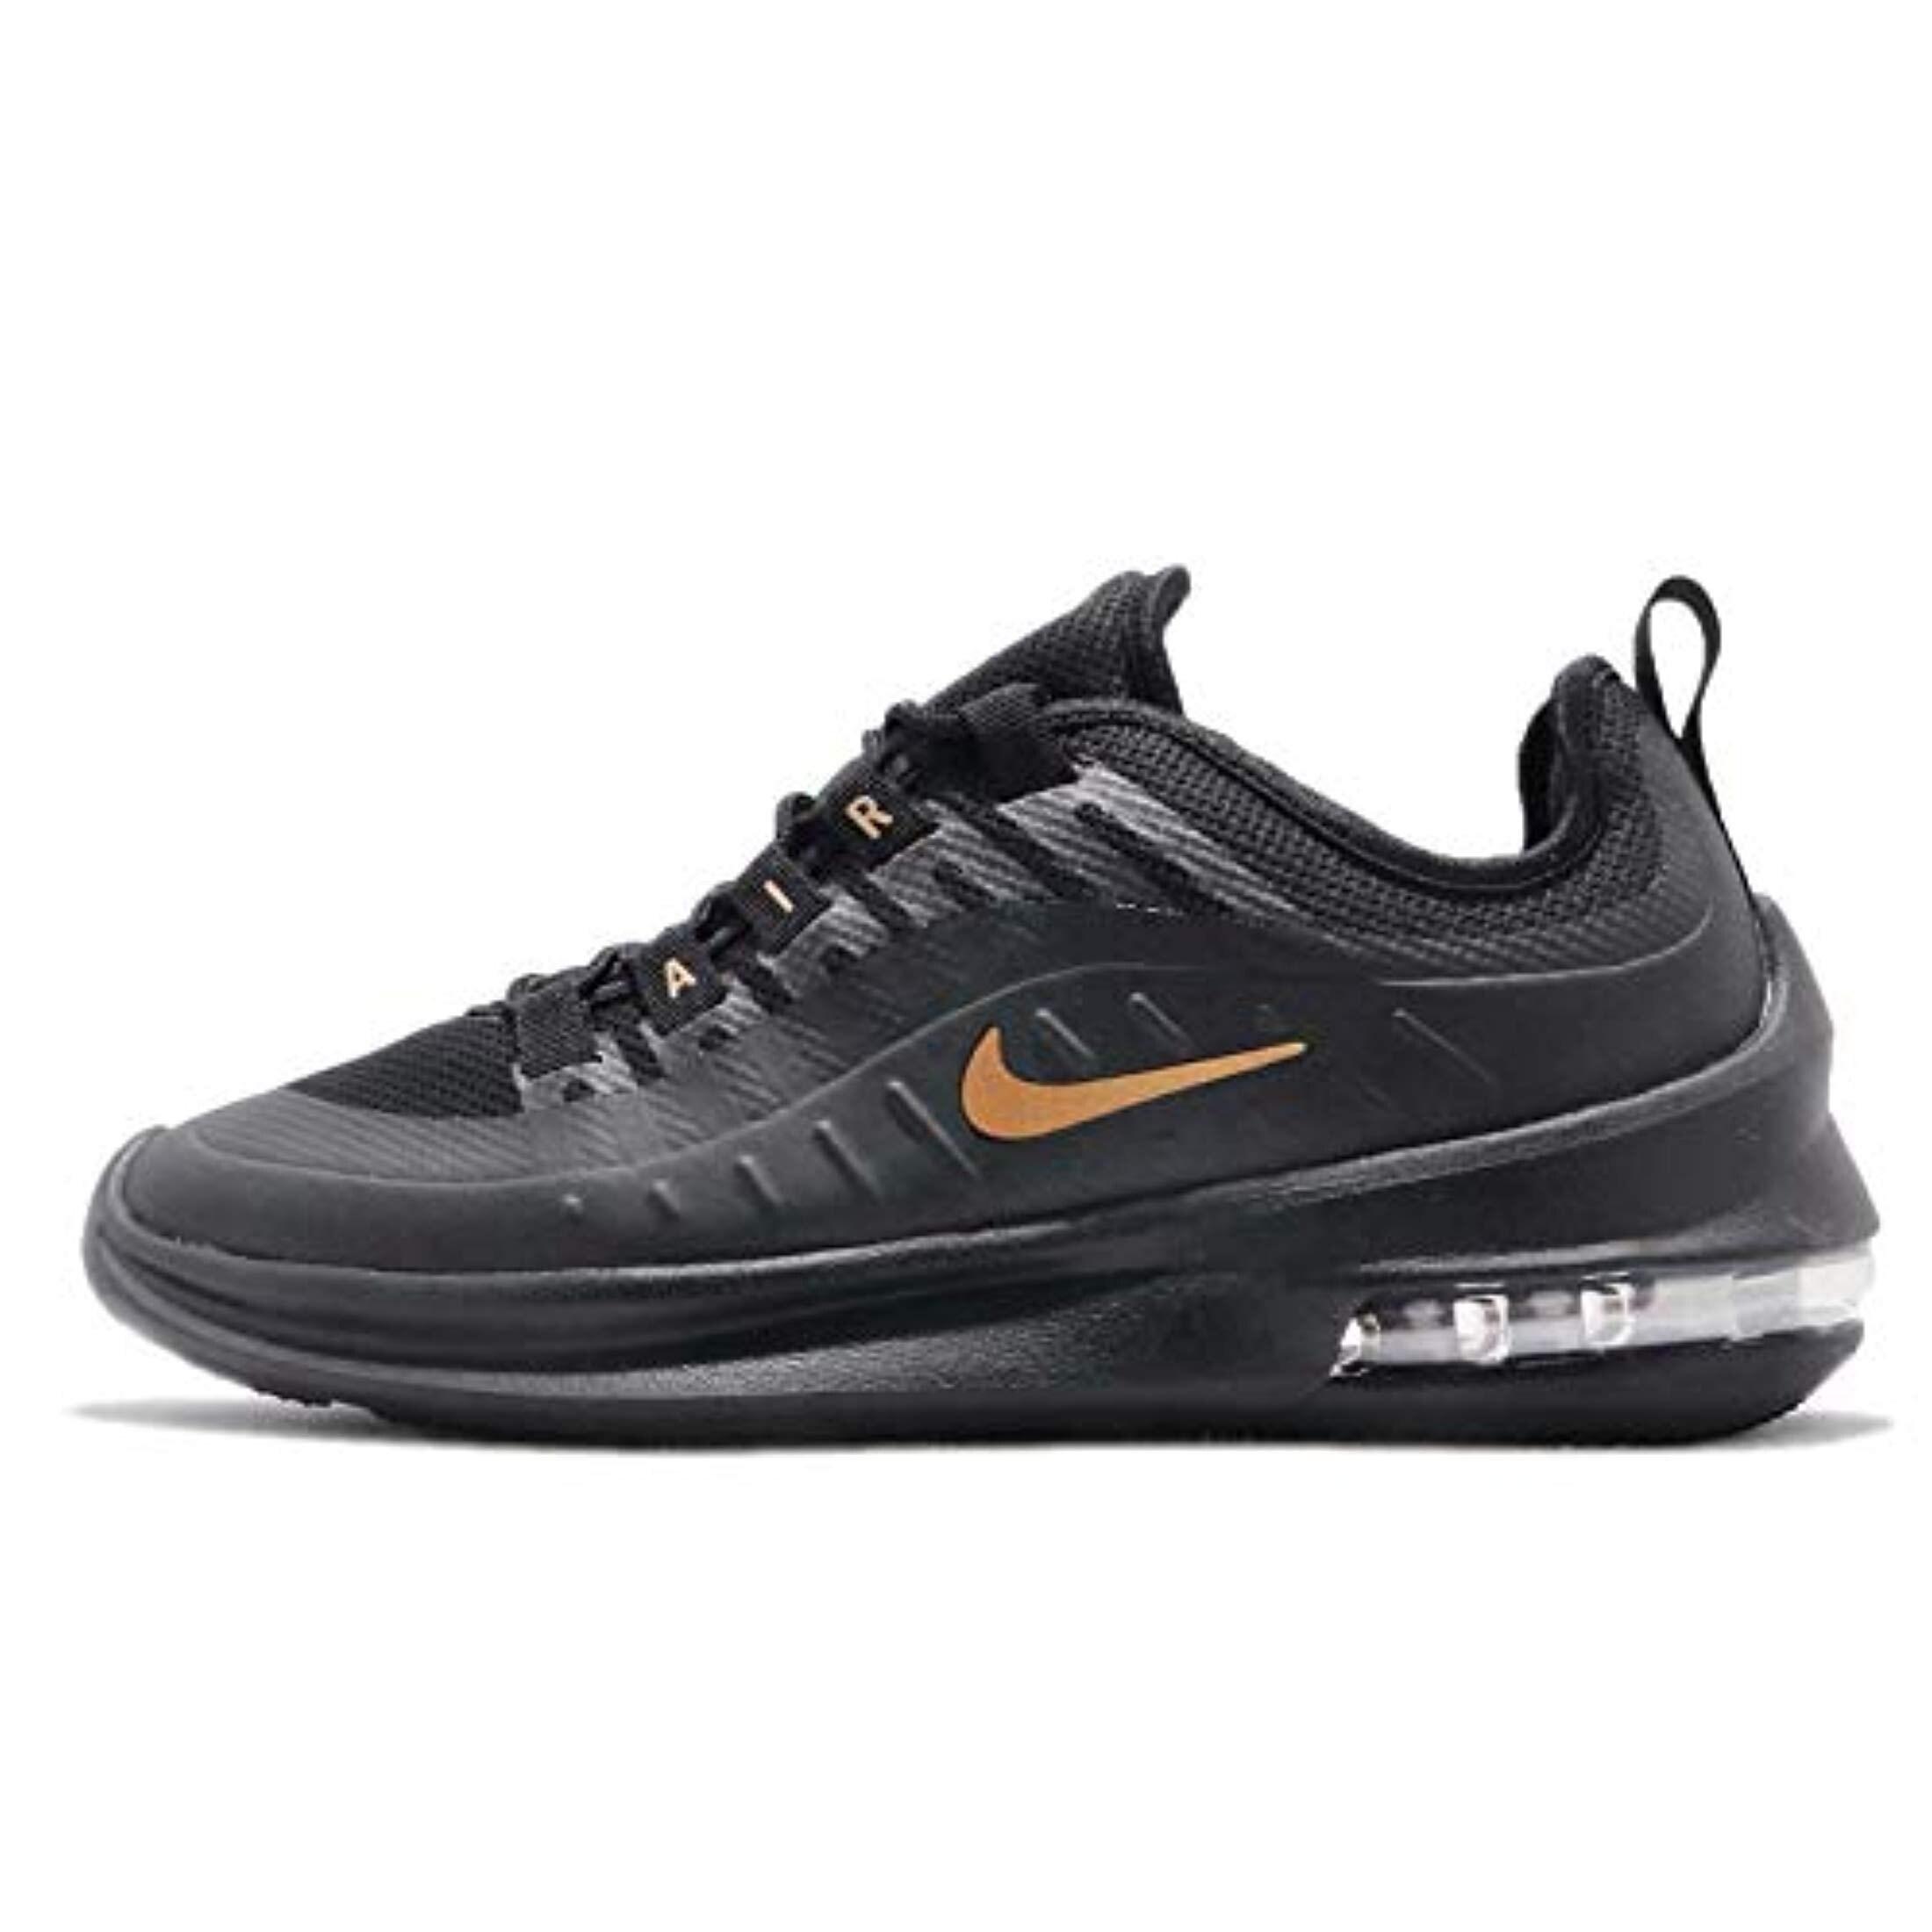 Nike Women's Air Max Axis Running Shoe, Black/Metallic Gold